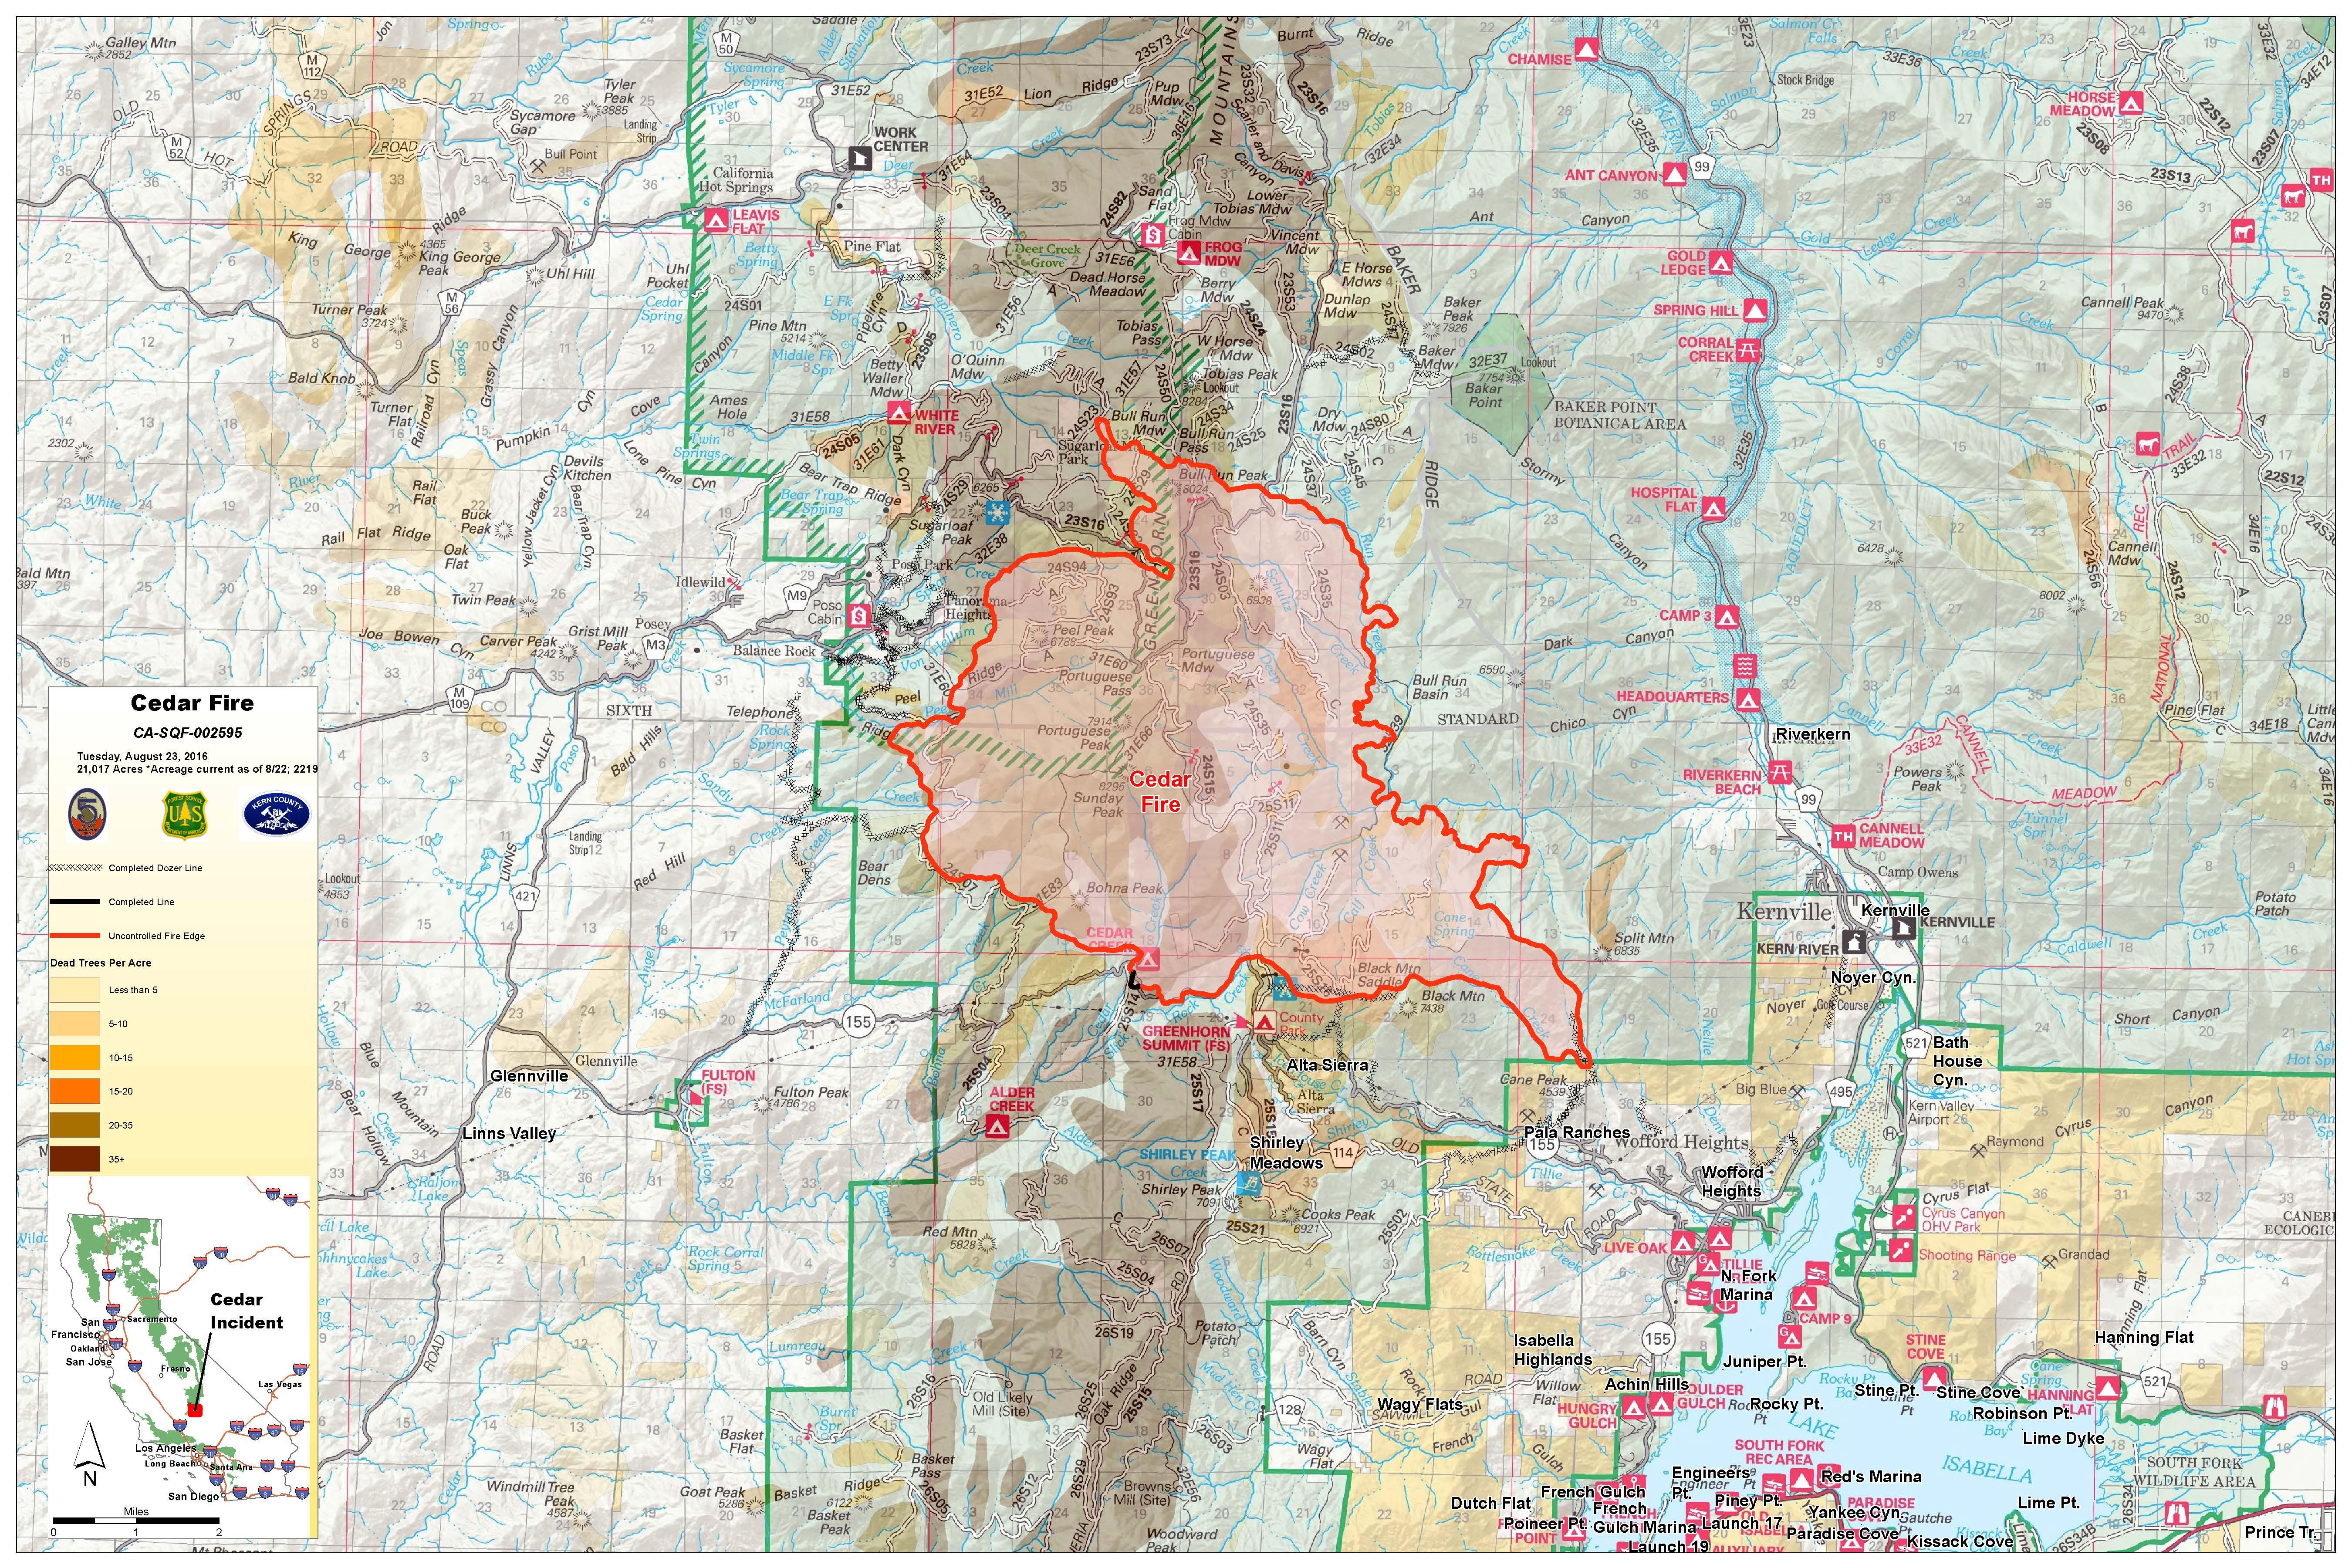 Cedar Fire Map on